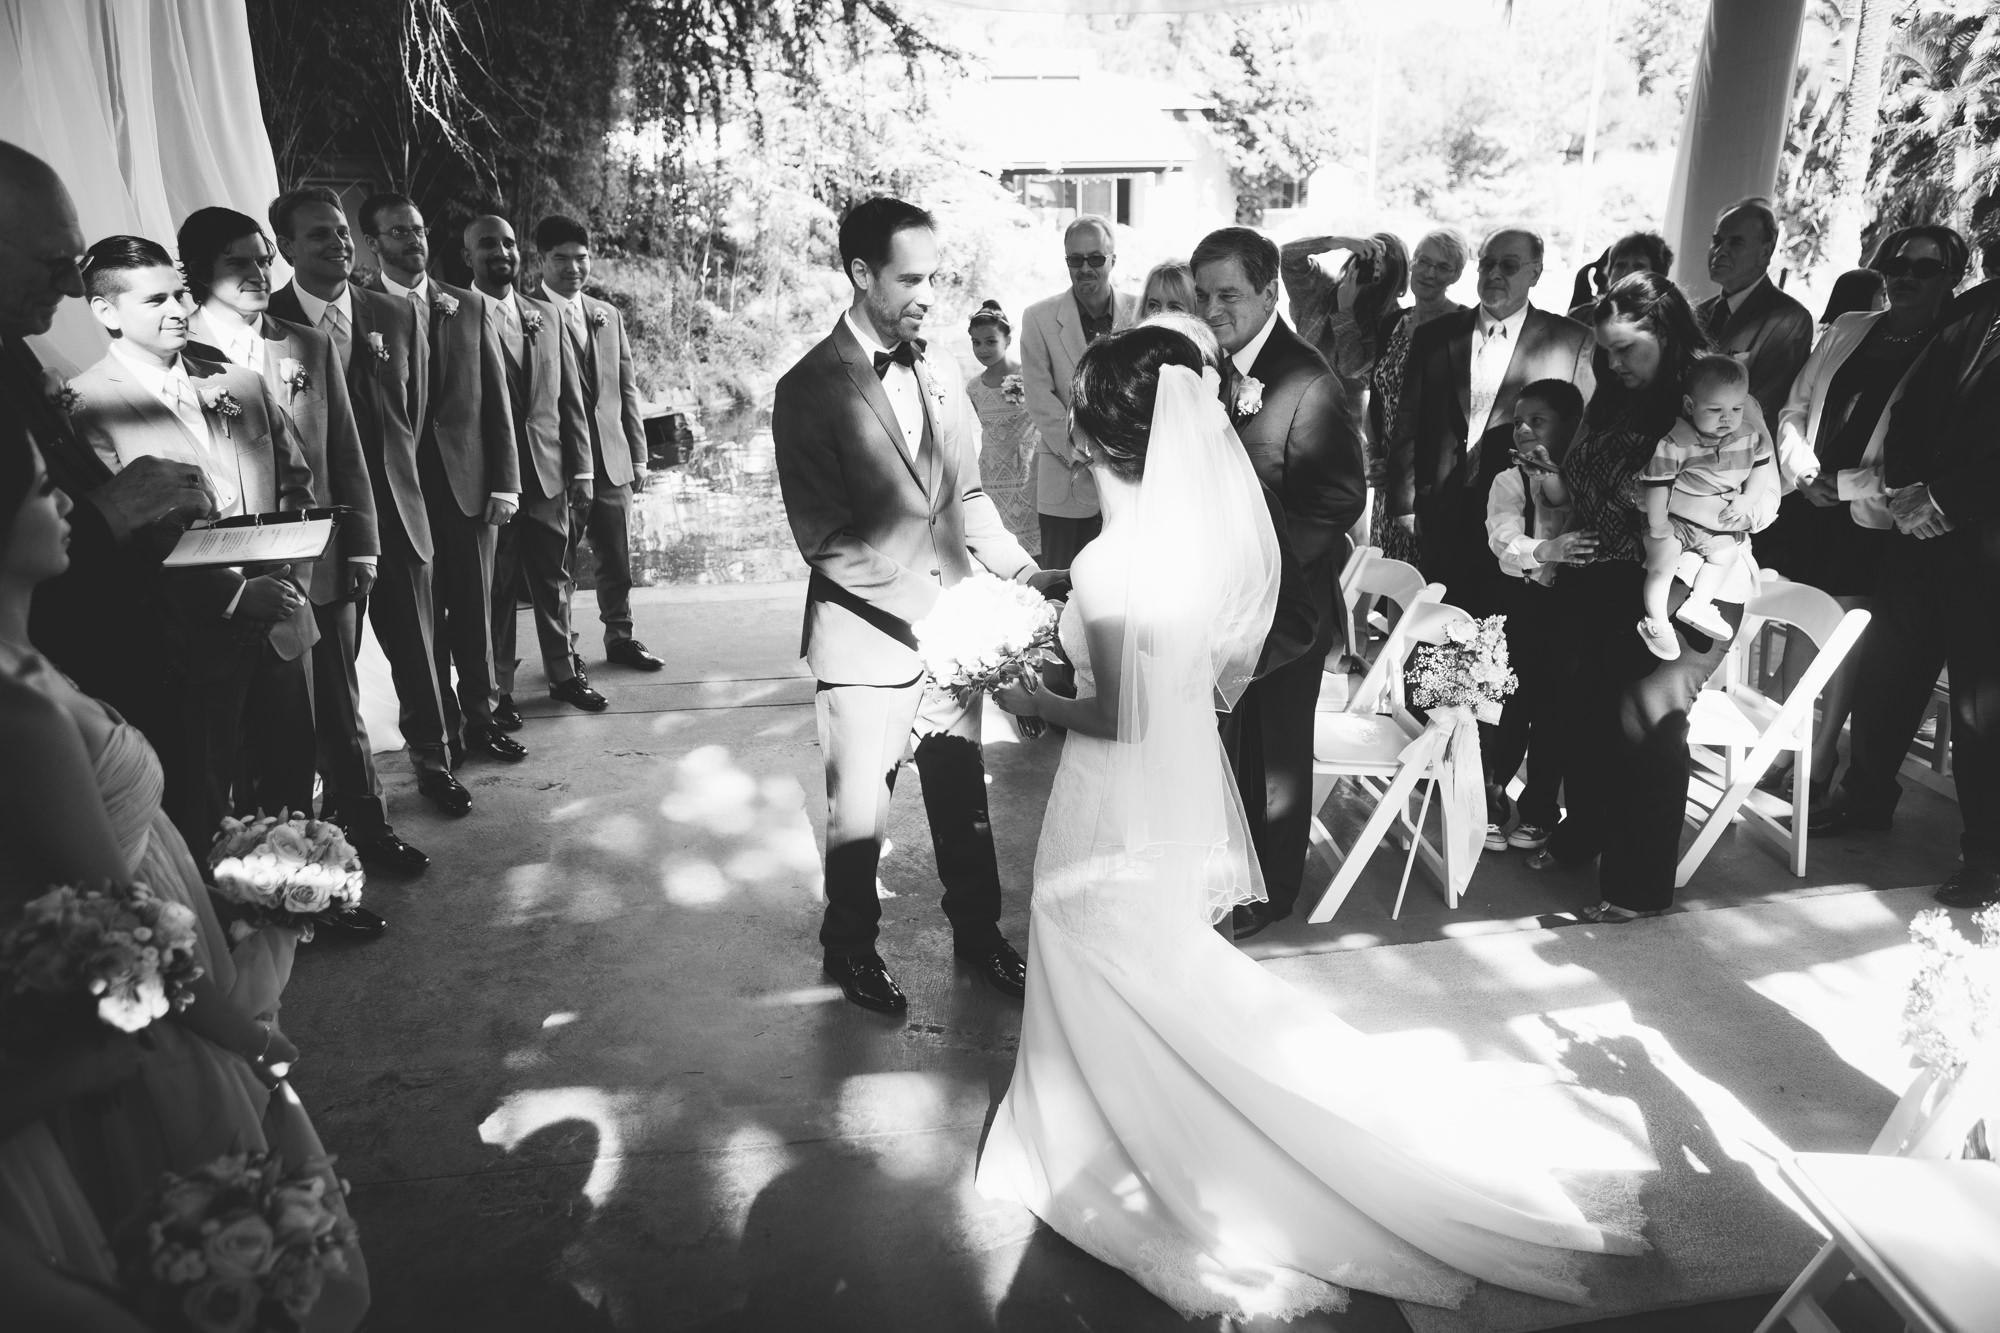 Alice_&_Aaron_Wedding_by_The_Light_&_Glass_Photography-062.jpg